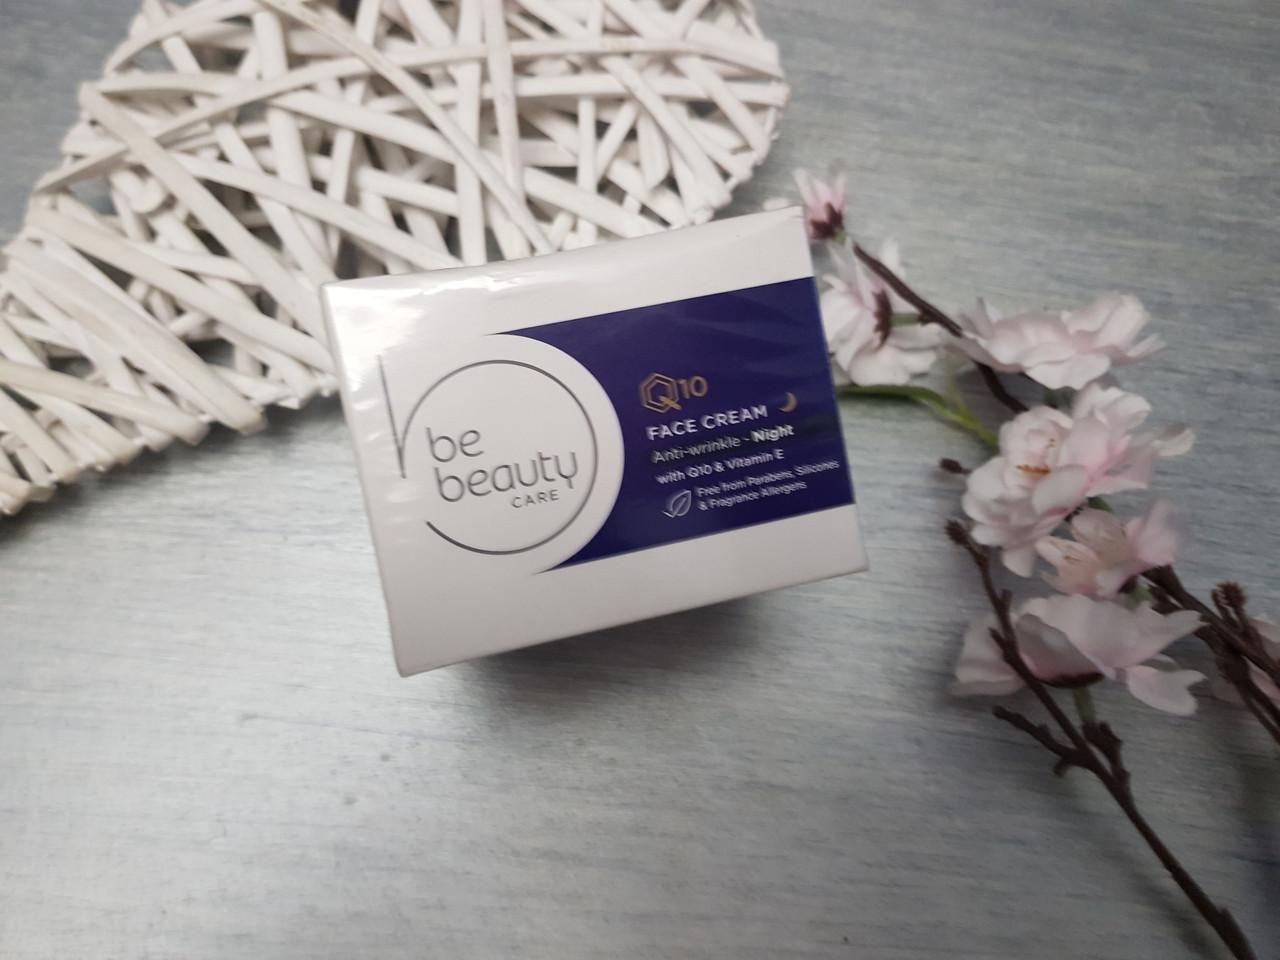 Восстанавливающий ночной крем против морщин  Be Beauty care Q10 Витамин Е  50 мл